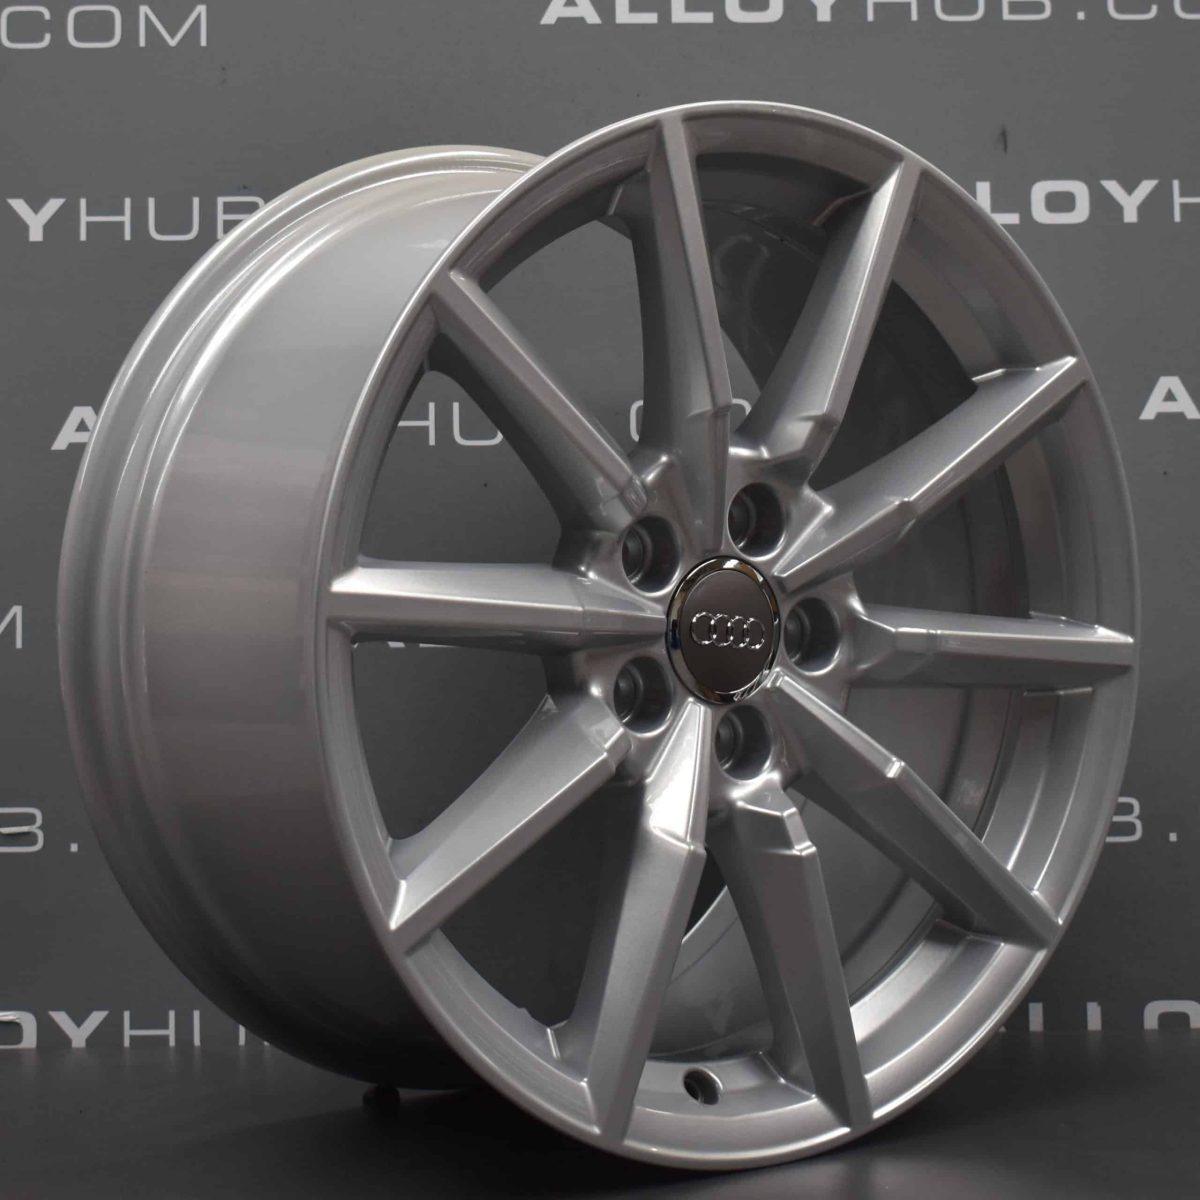 "Genuine Audi TT 8S MK3 10 Spoke 18"" Inch Alloy Wheels with Silver Finish 8S0 601 025 C"